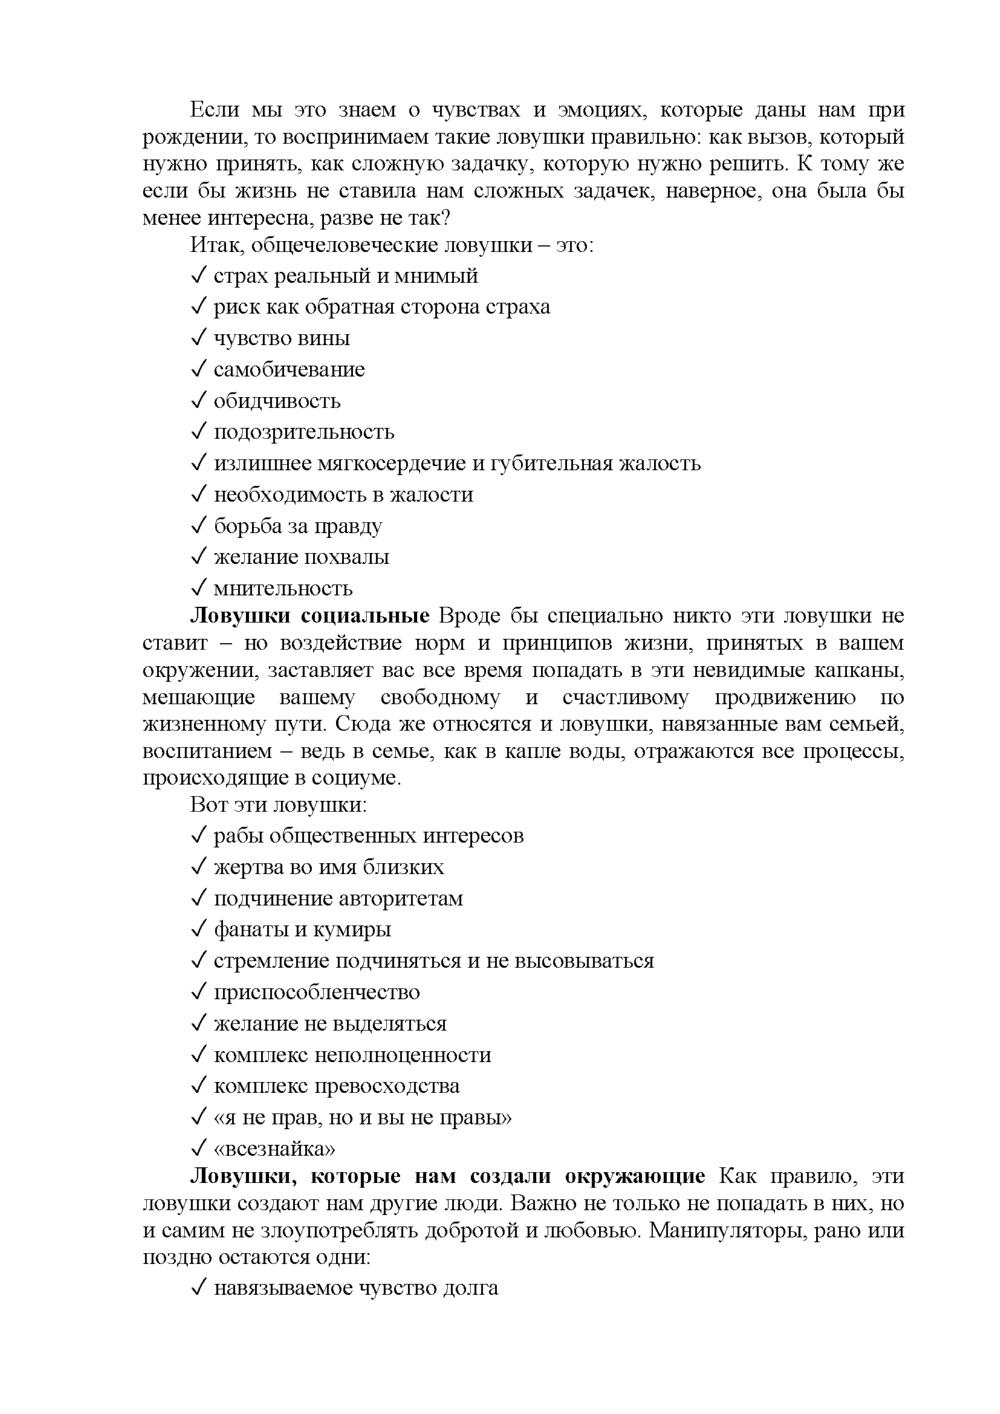 http://i6.imageban.ru/out/2013/12/03/c1dca9b903453ff7f0faf7711367cf92.jpg